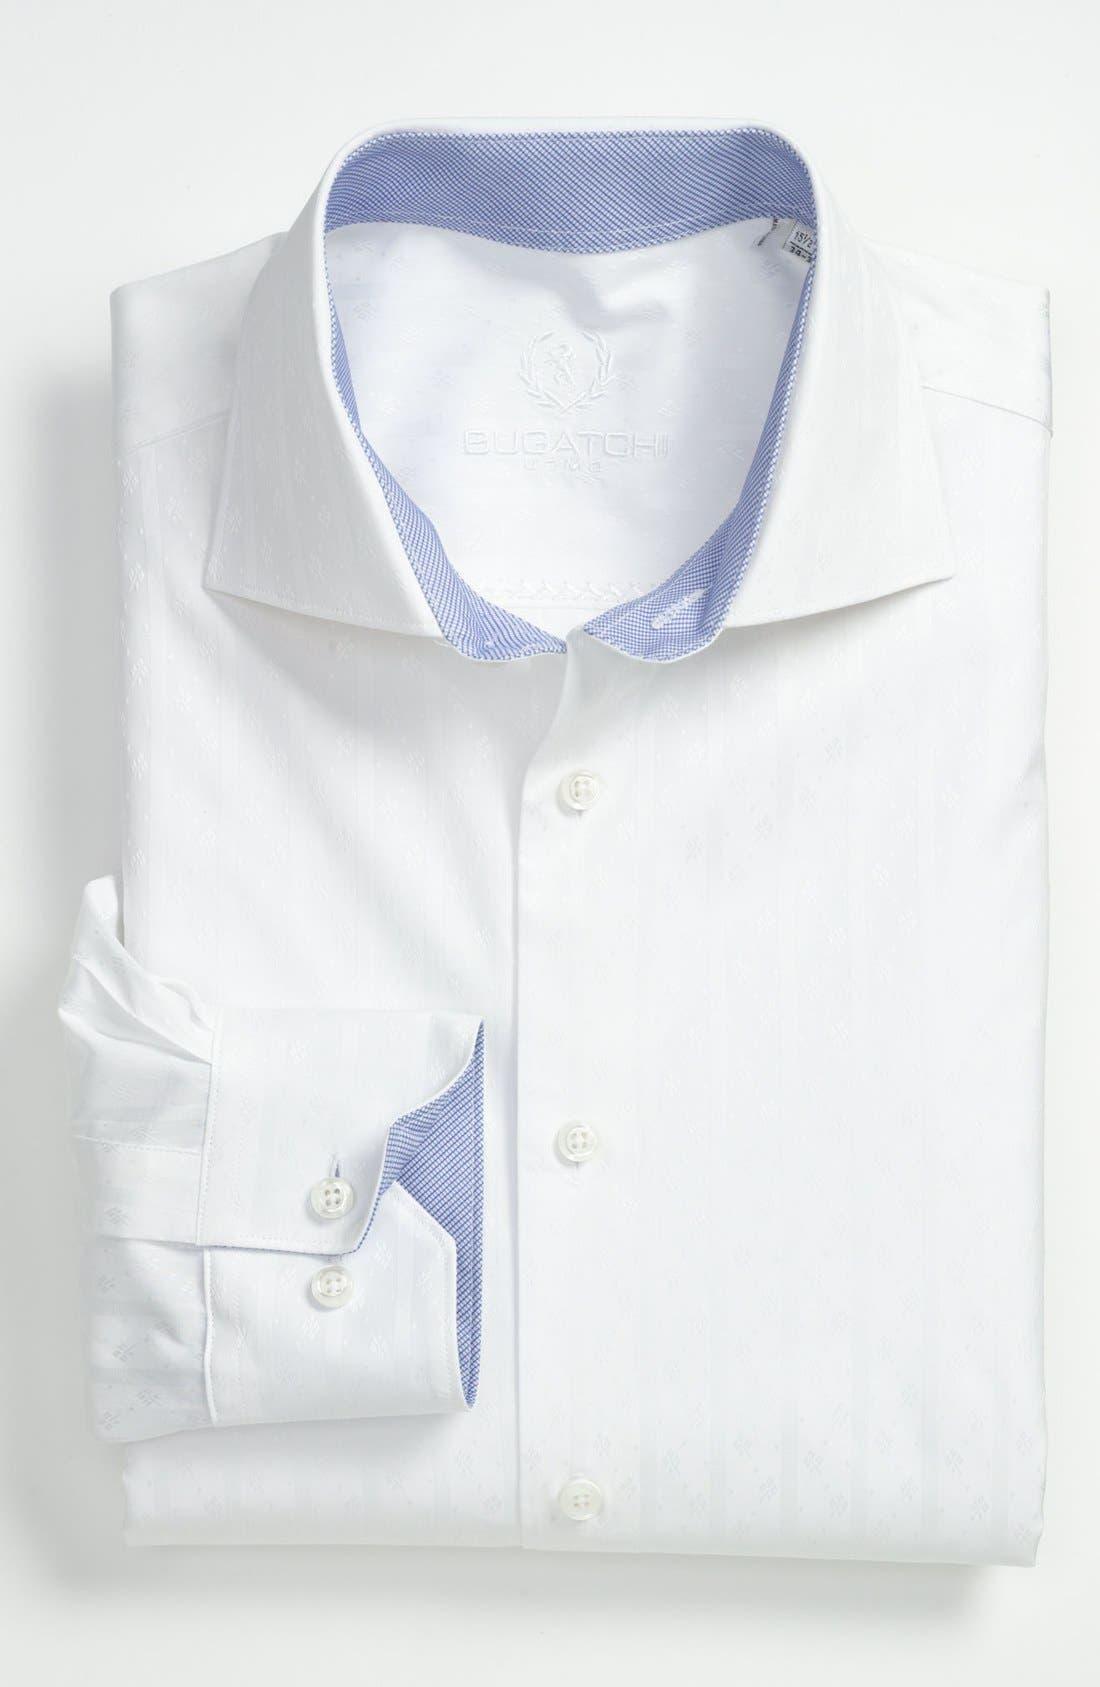 Alternate Image 1 Selected - Bugatchi Trim Fit Dress Shirt